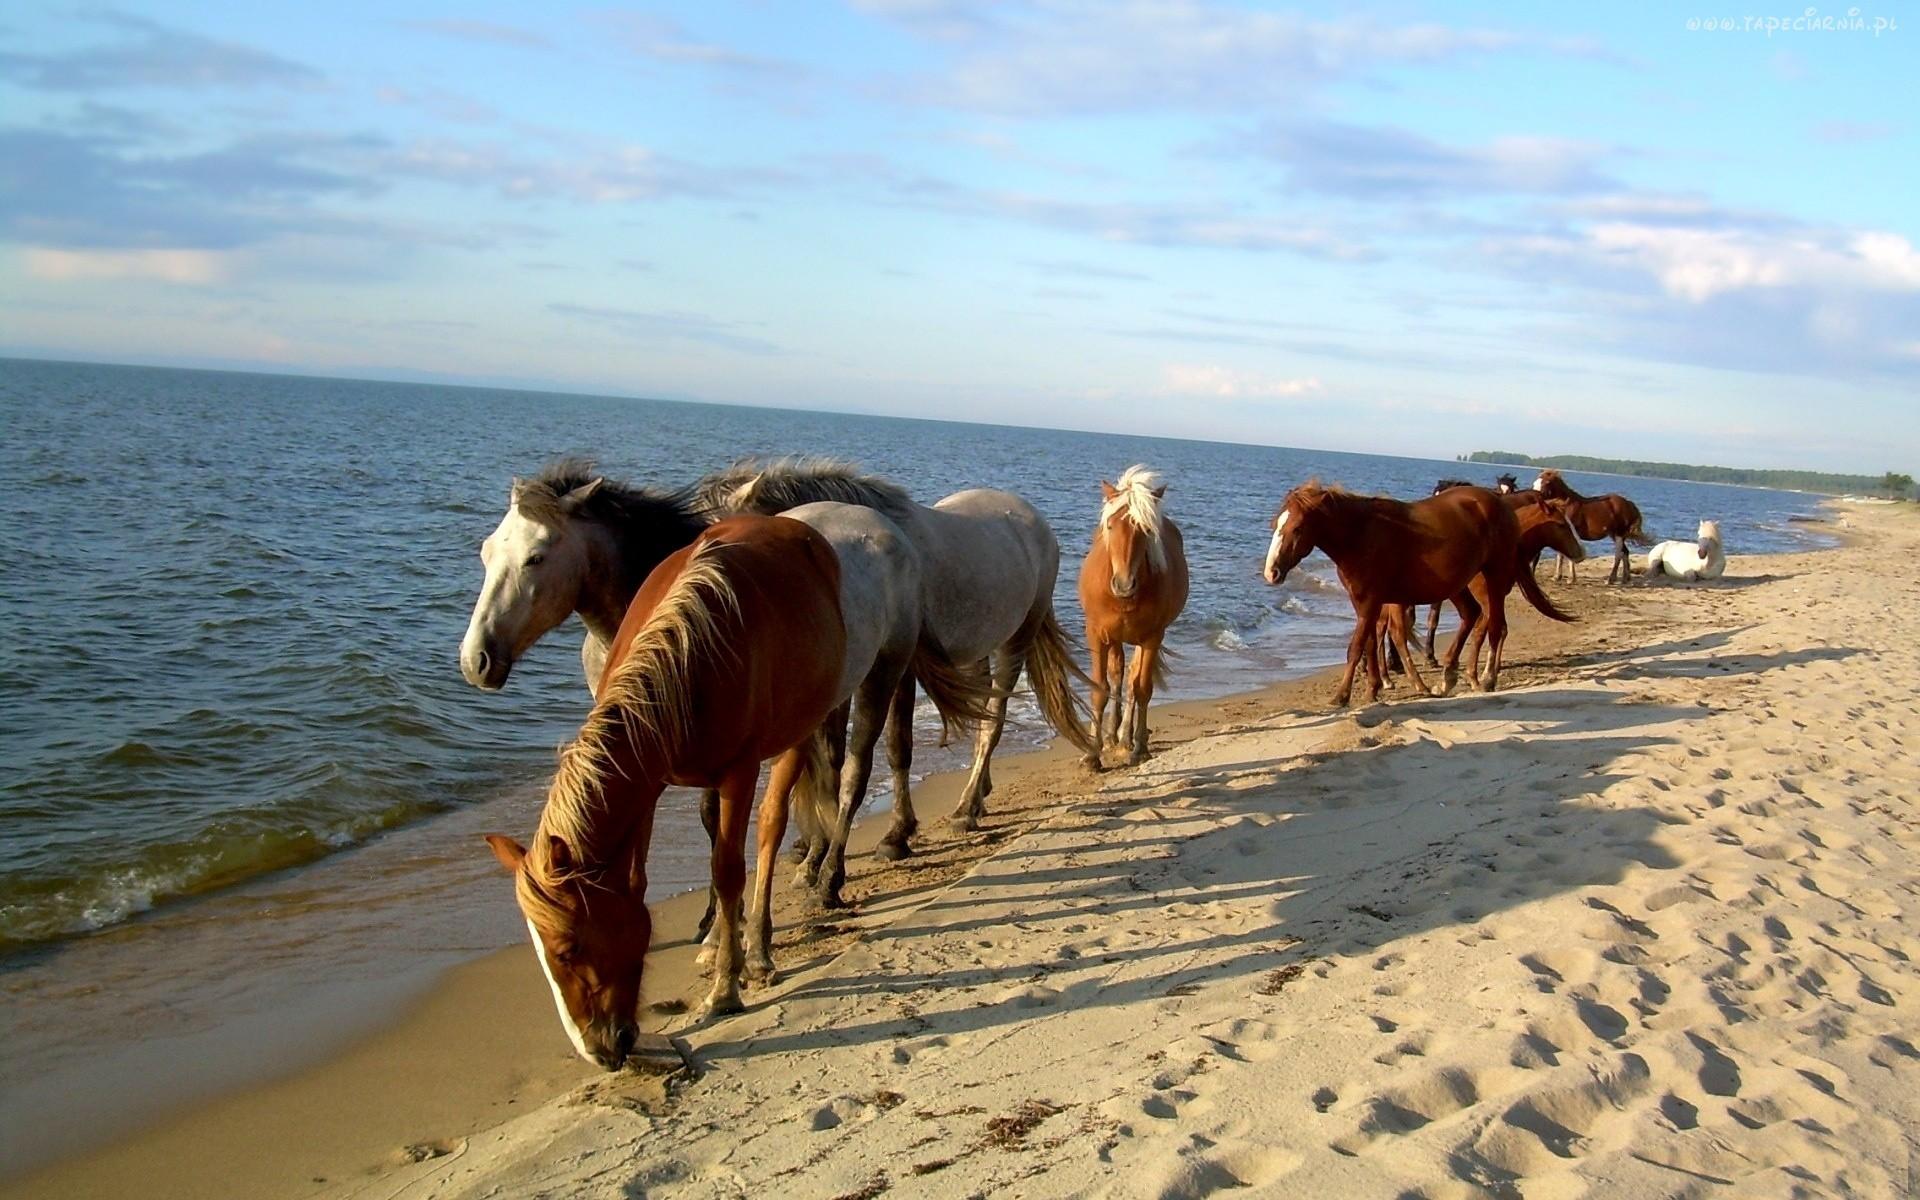 Horses on the beach wallpaper wallpapersafari for Fond ecran plage gratuit